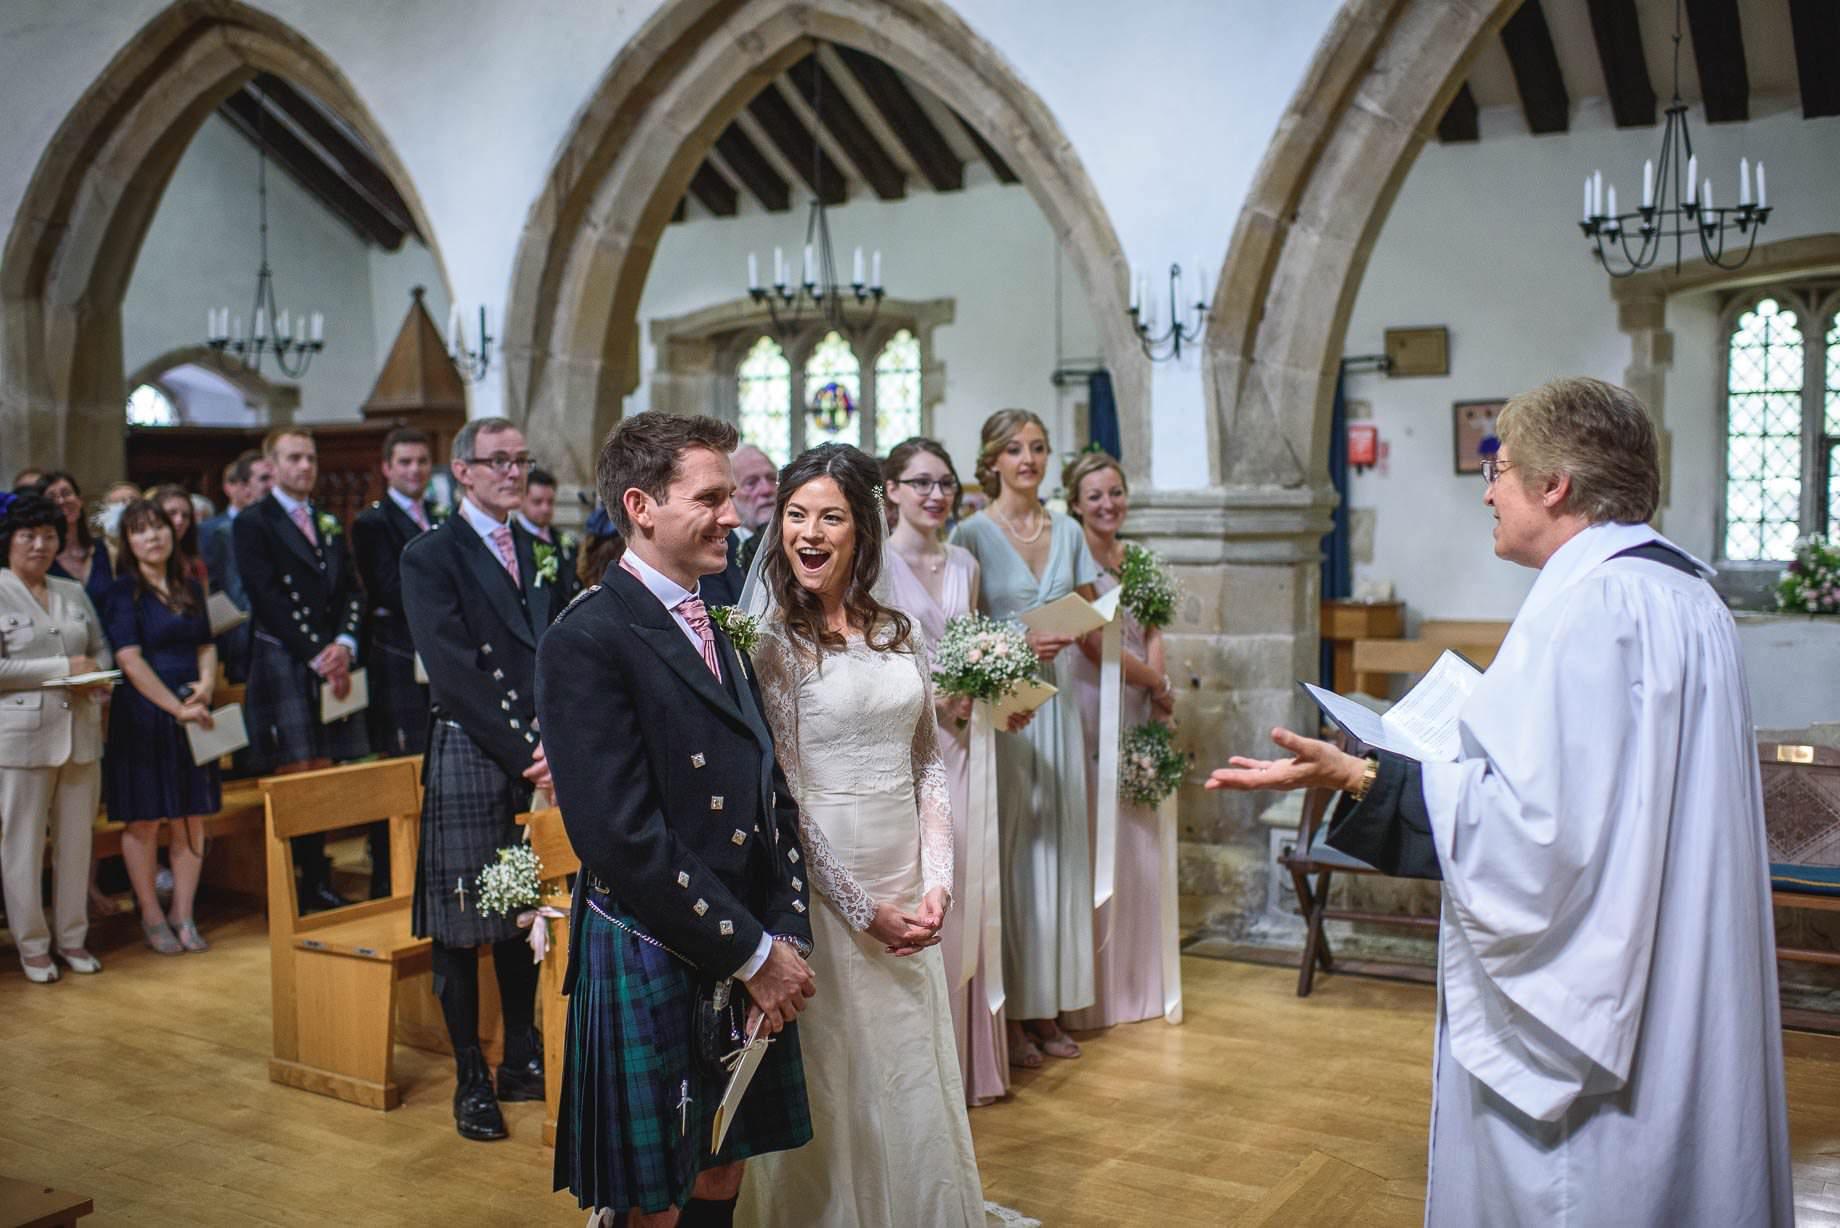 Gildings Barn wedding photography - Sarah and Steve (49 of 190)